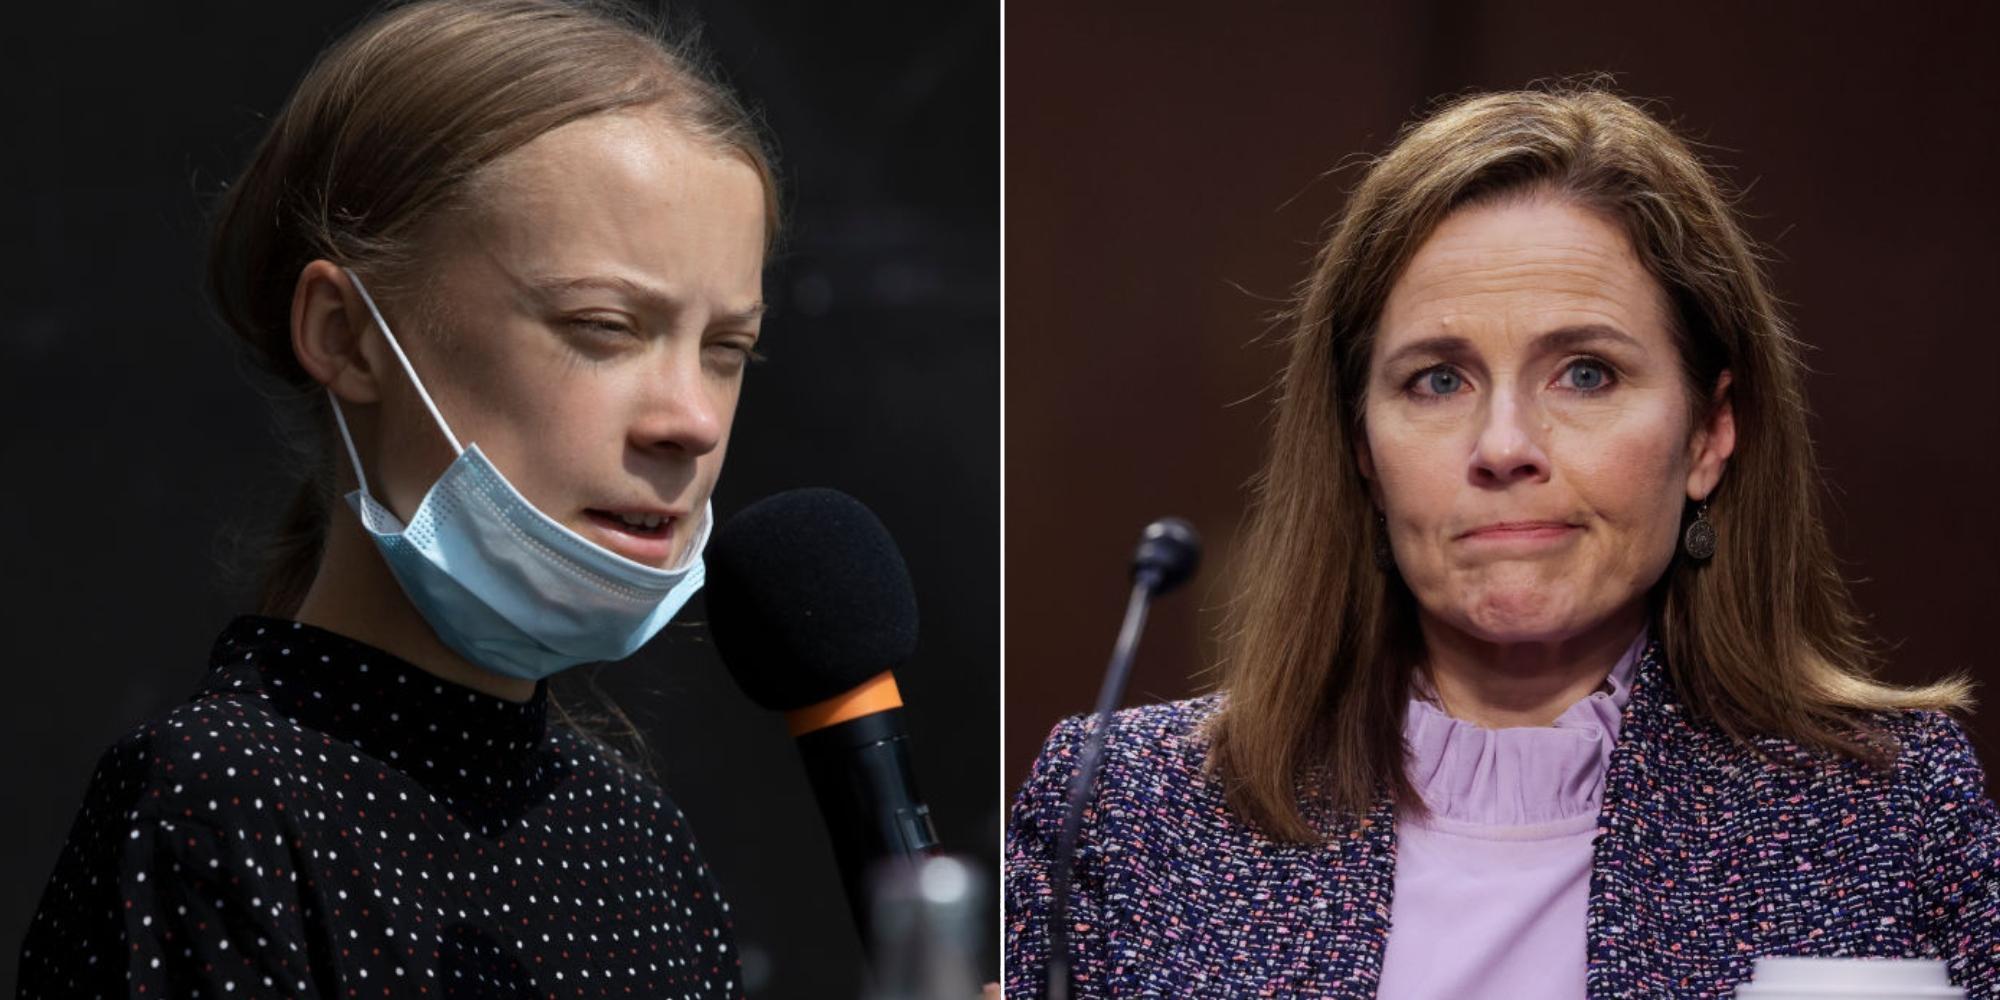 Greta Thunberg has perfect comeback to Amy Coney Barrett's 'views' on climate change